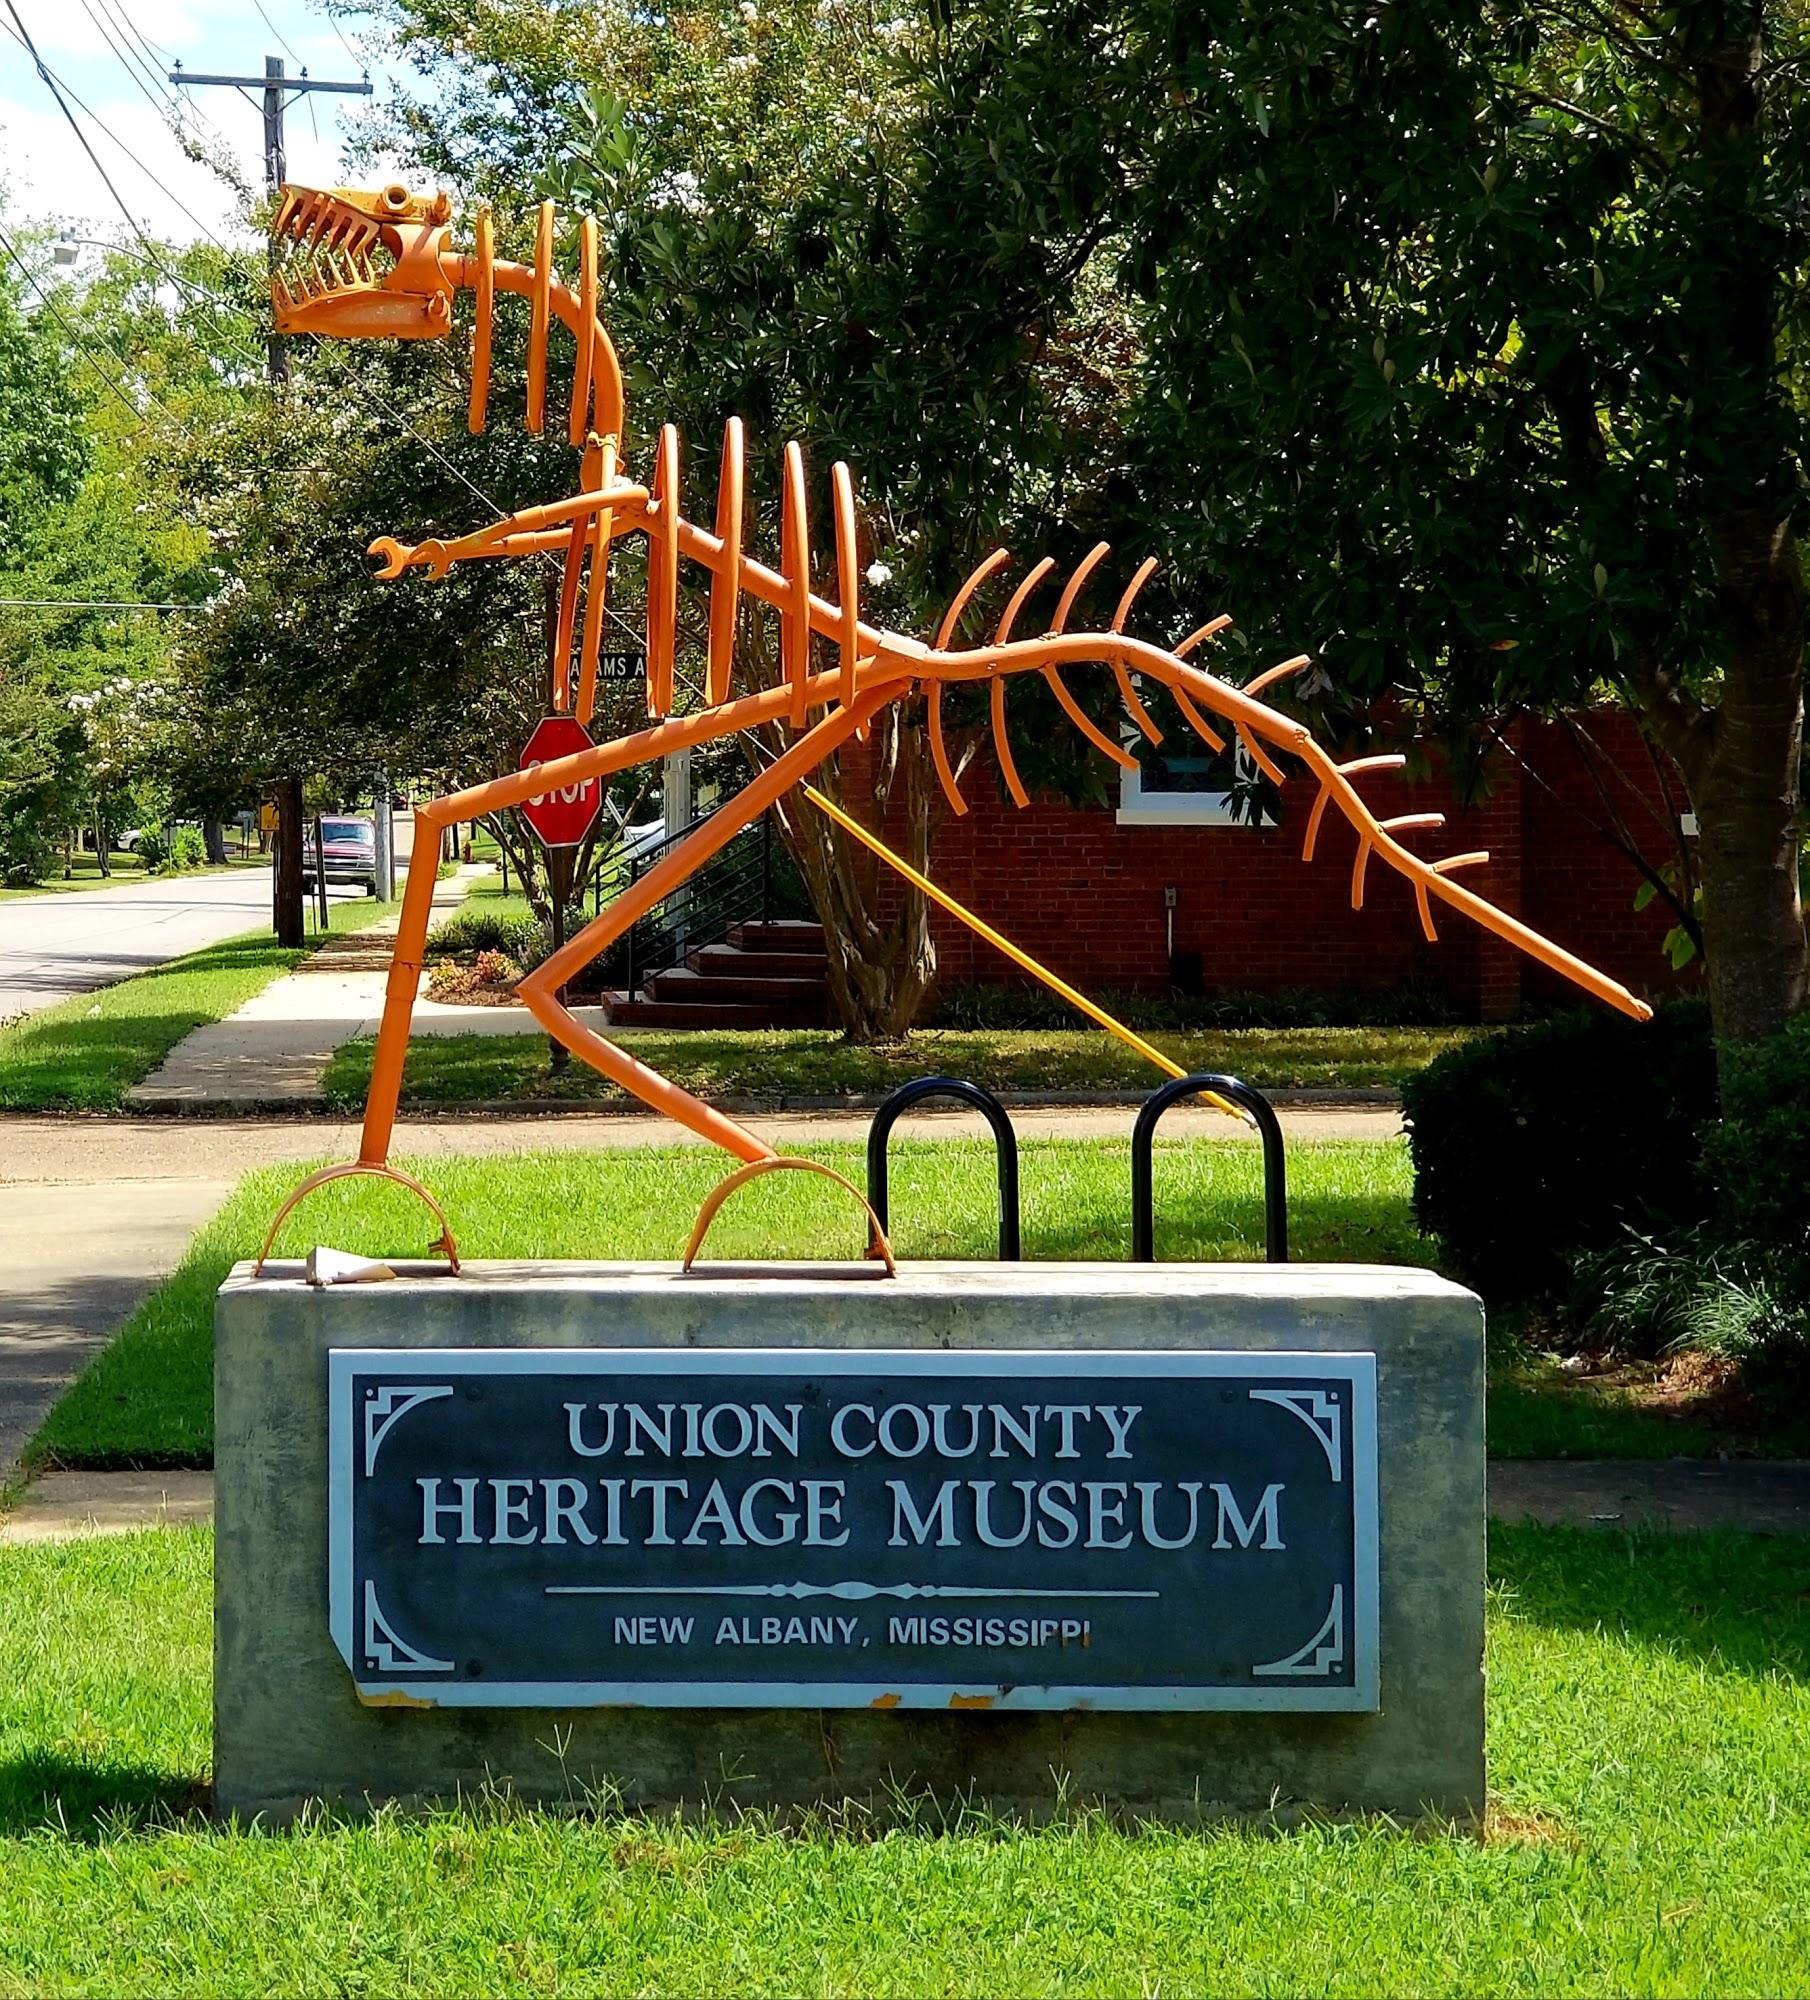 Union County Historical Society 114 Cleveland St, New Albany